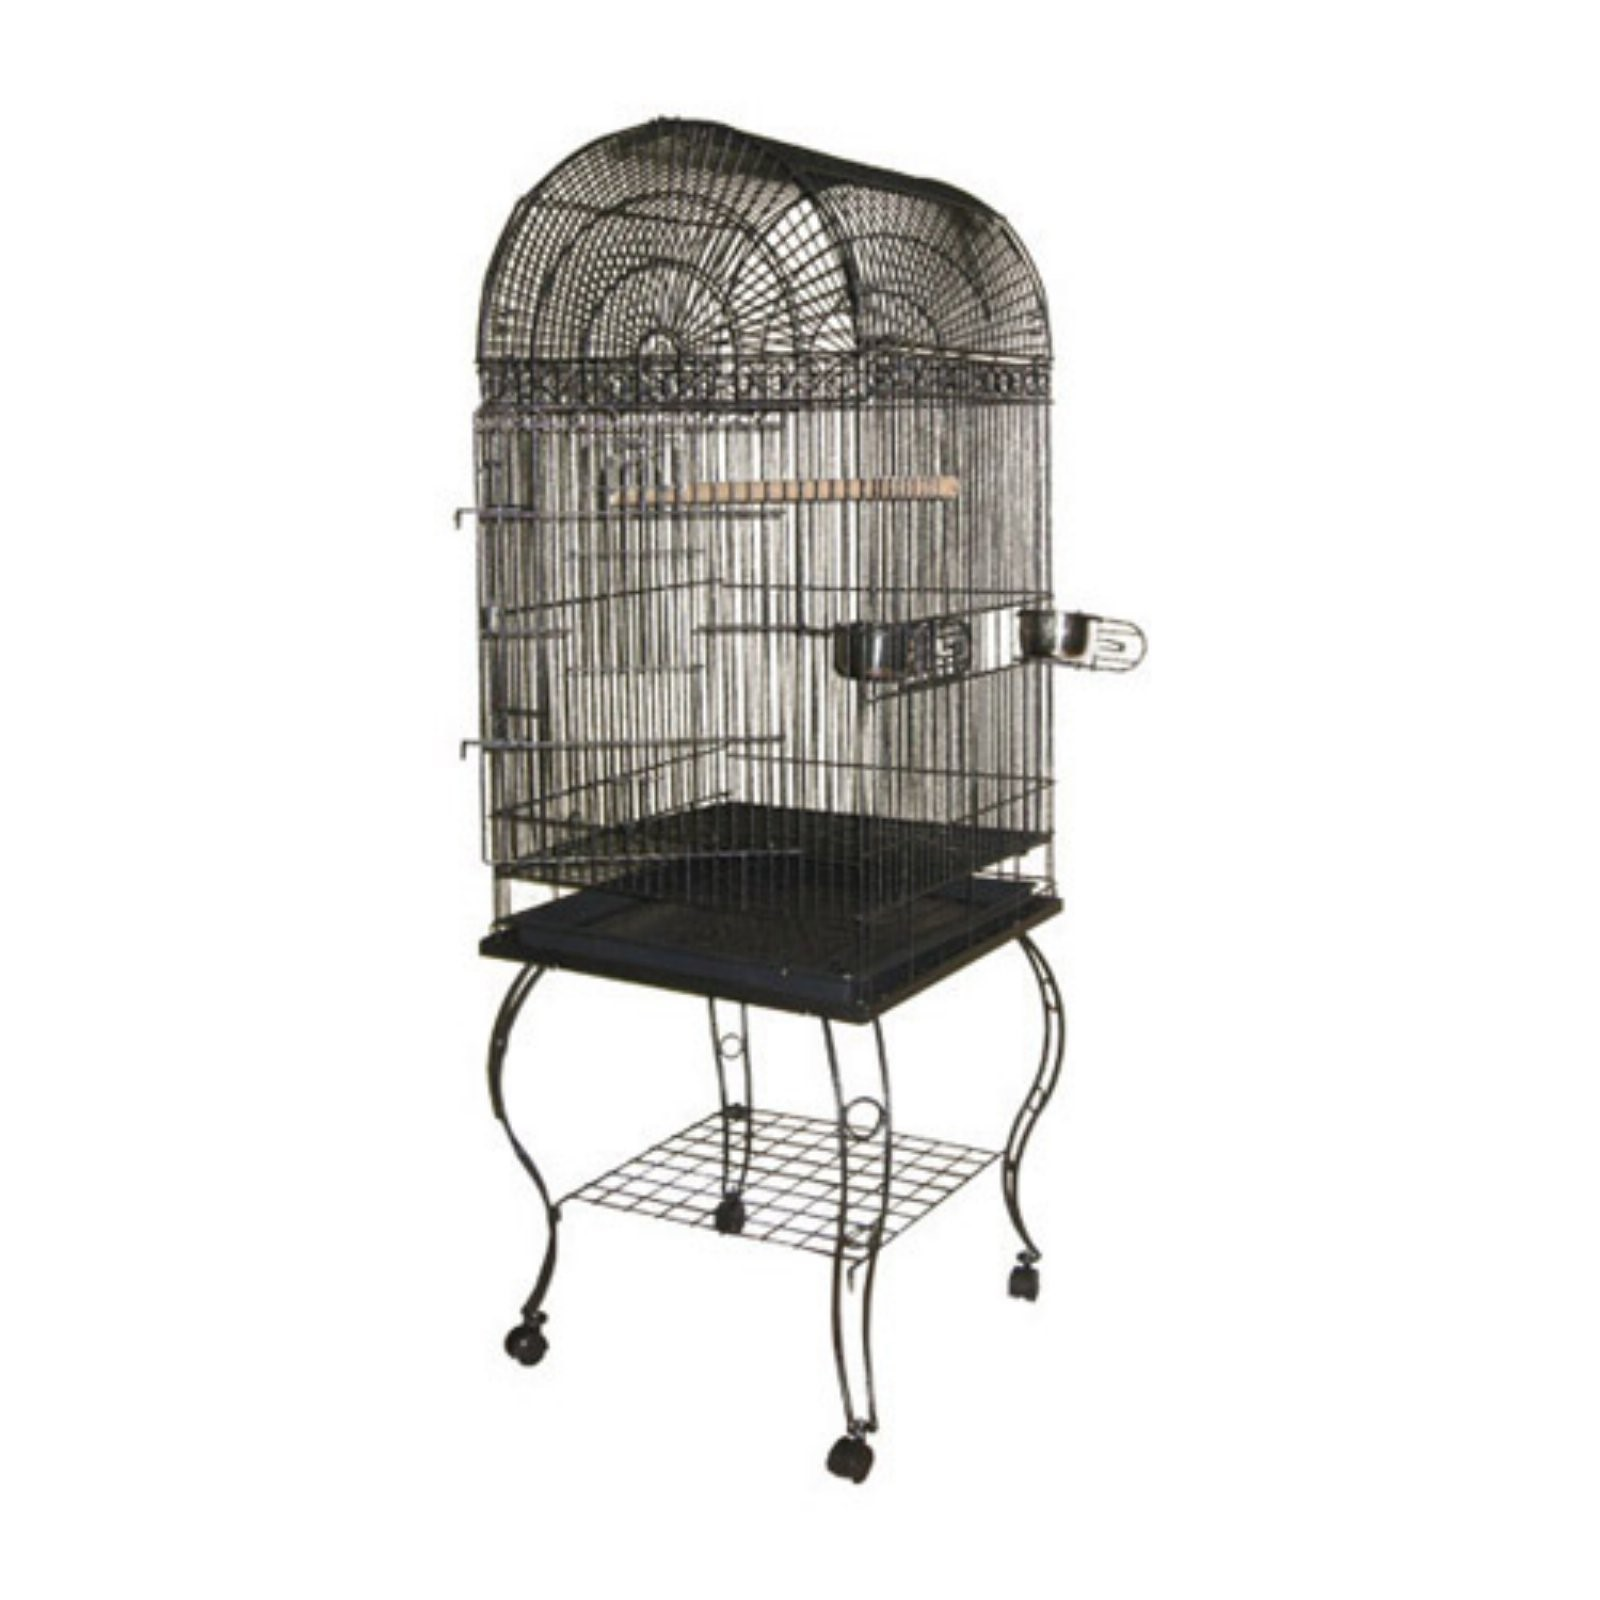 A and E Cage Co. Dome Top Bird Cage 600A